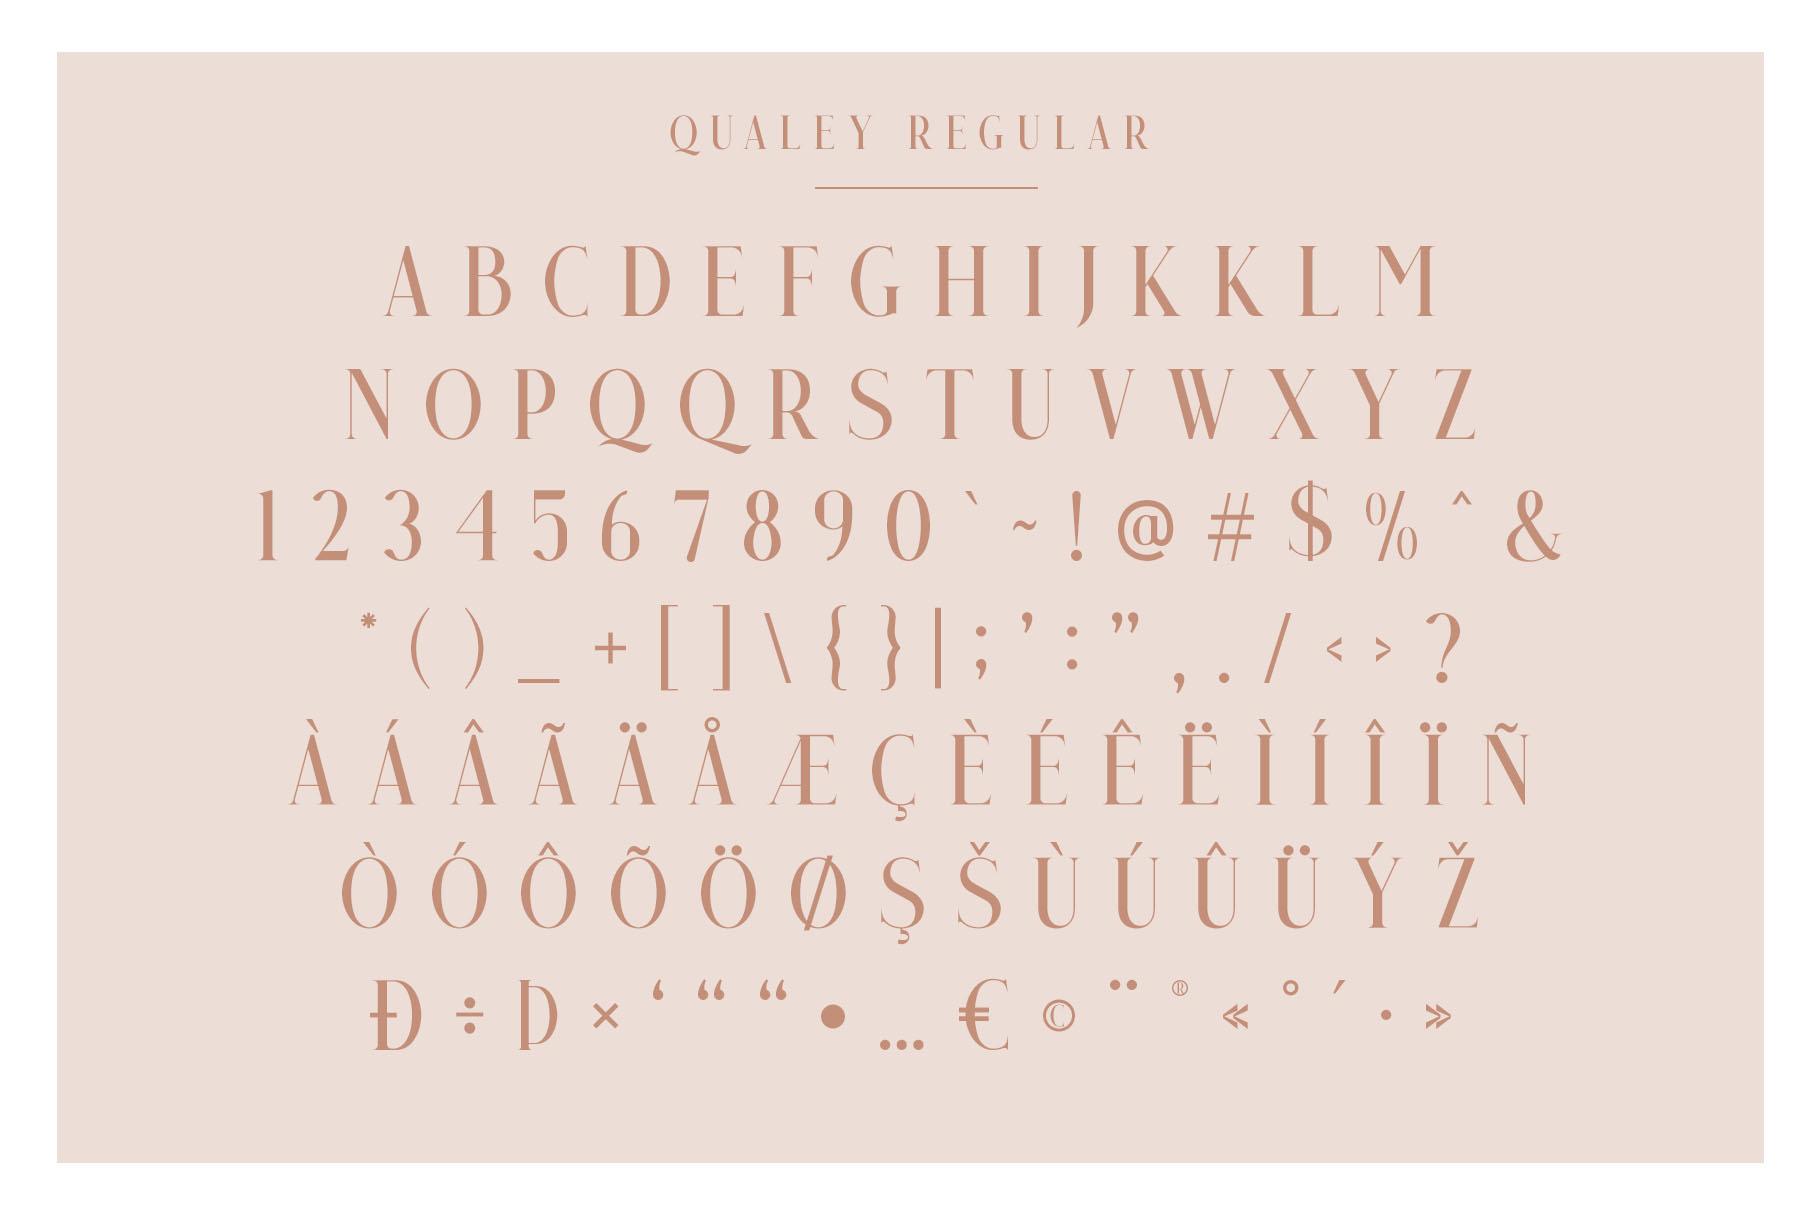 Qualey - Elegant Serif Font example image 8